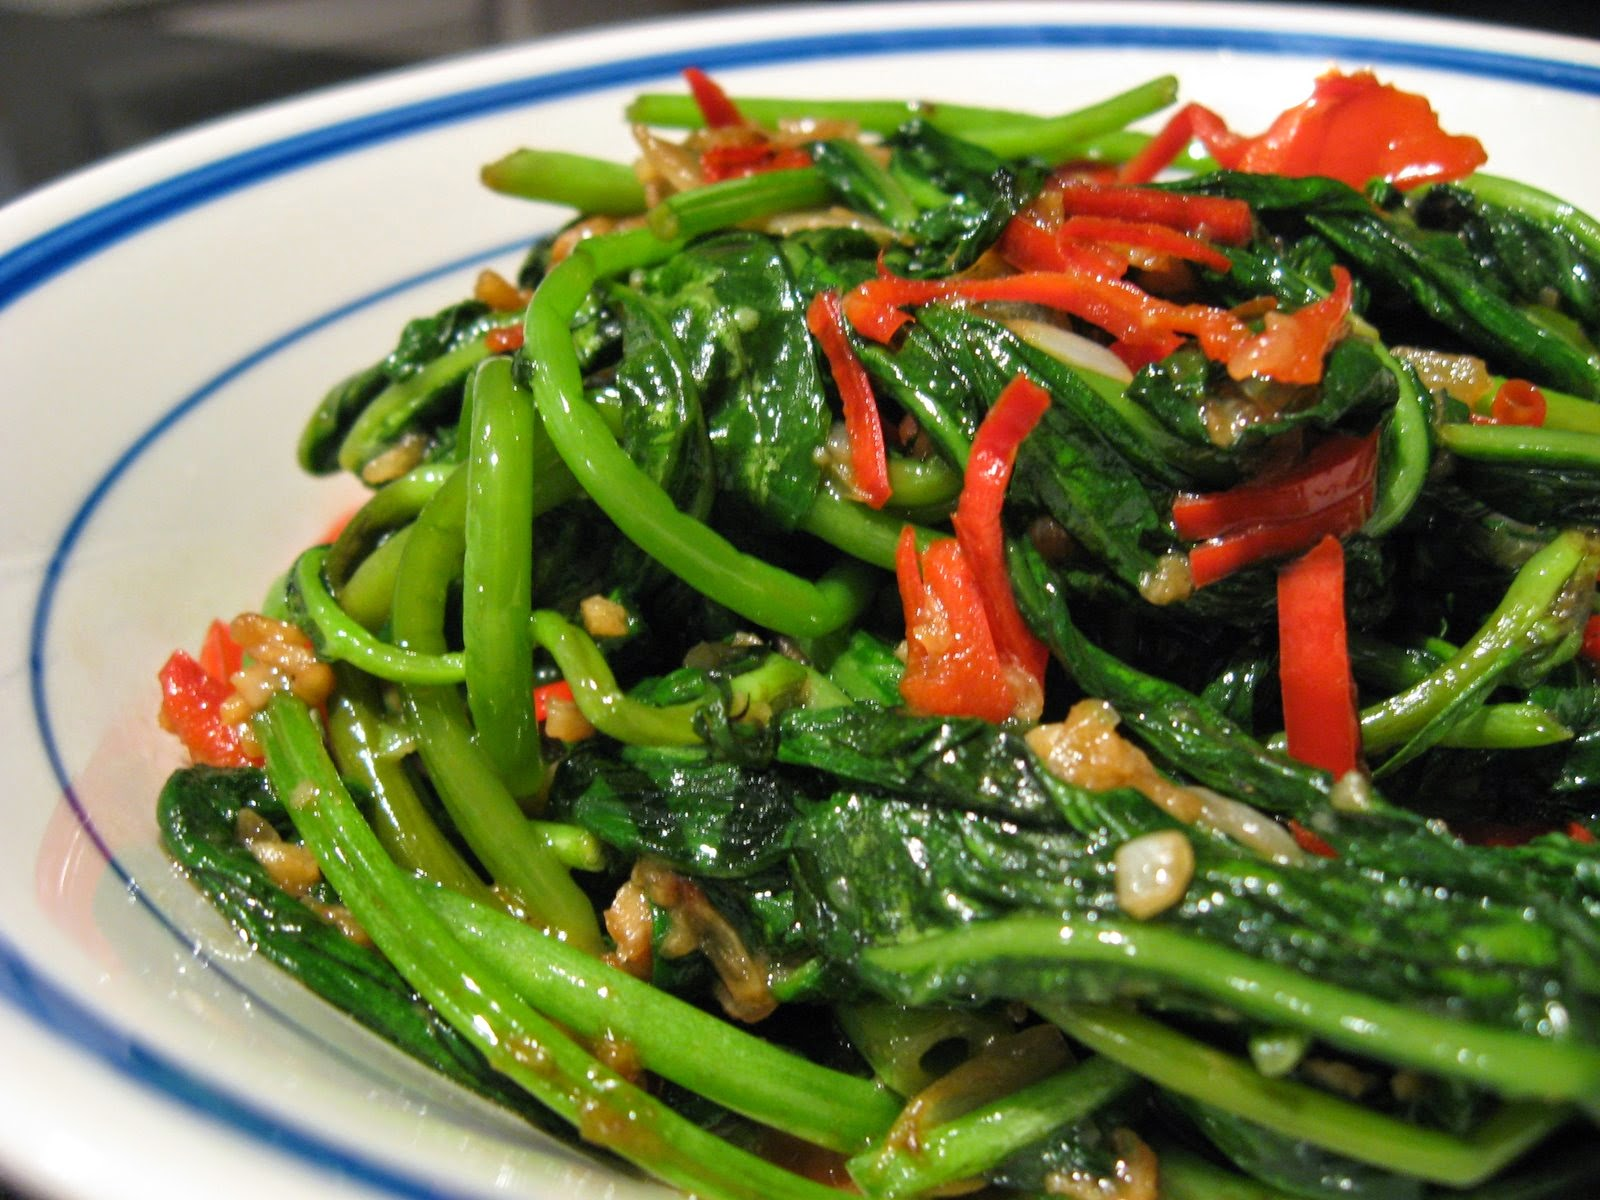 Resep masakan sayuran hijau